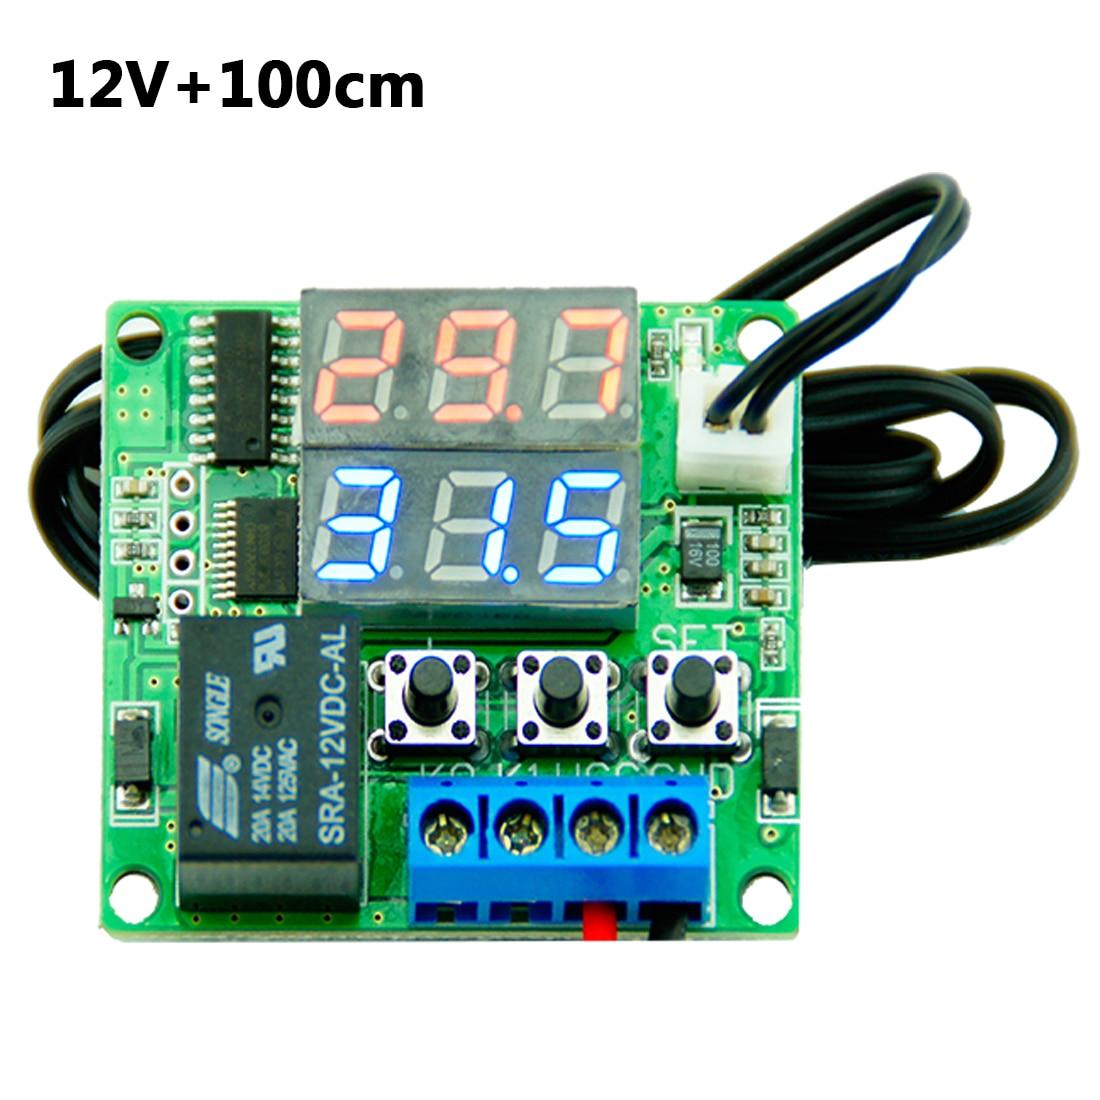 12V Intelligent Digital Thermostat Temperature Controller Regulator with NTC